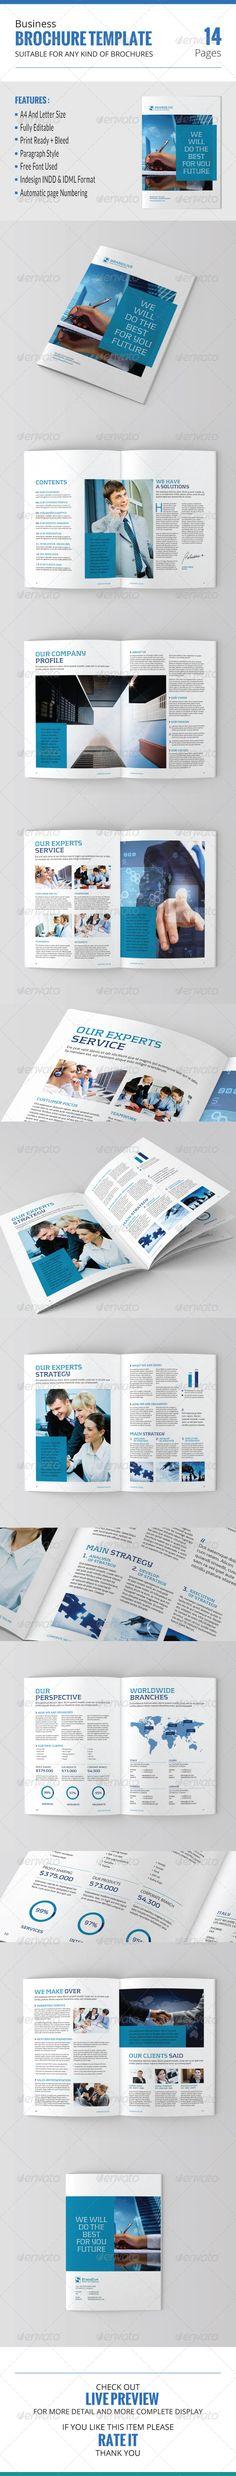 Company Profile Lifestyle, Originals and Magazines - company business profile template